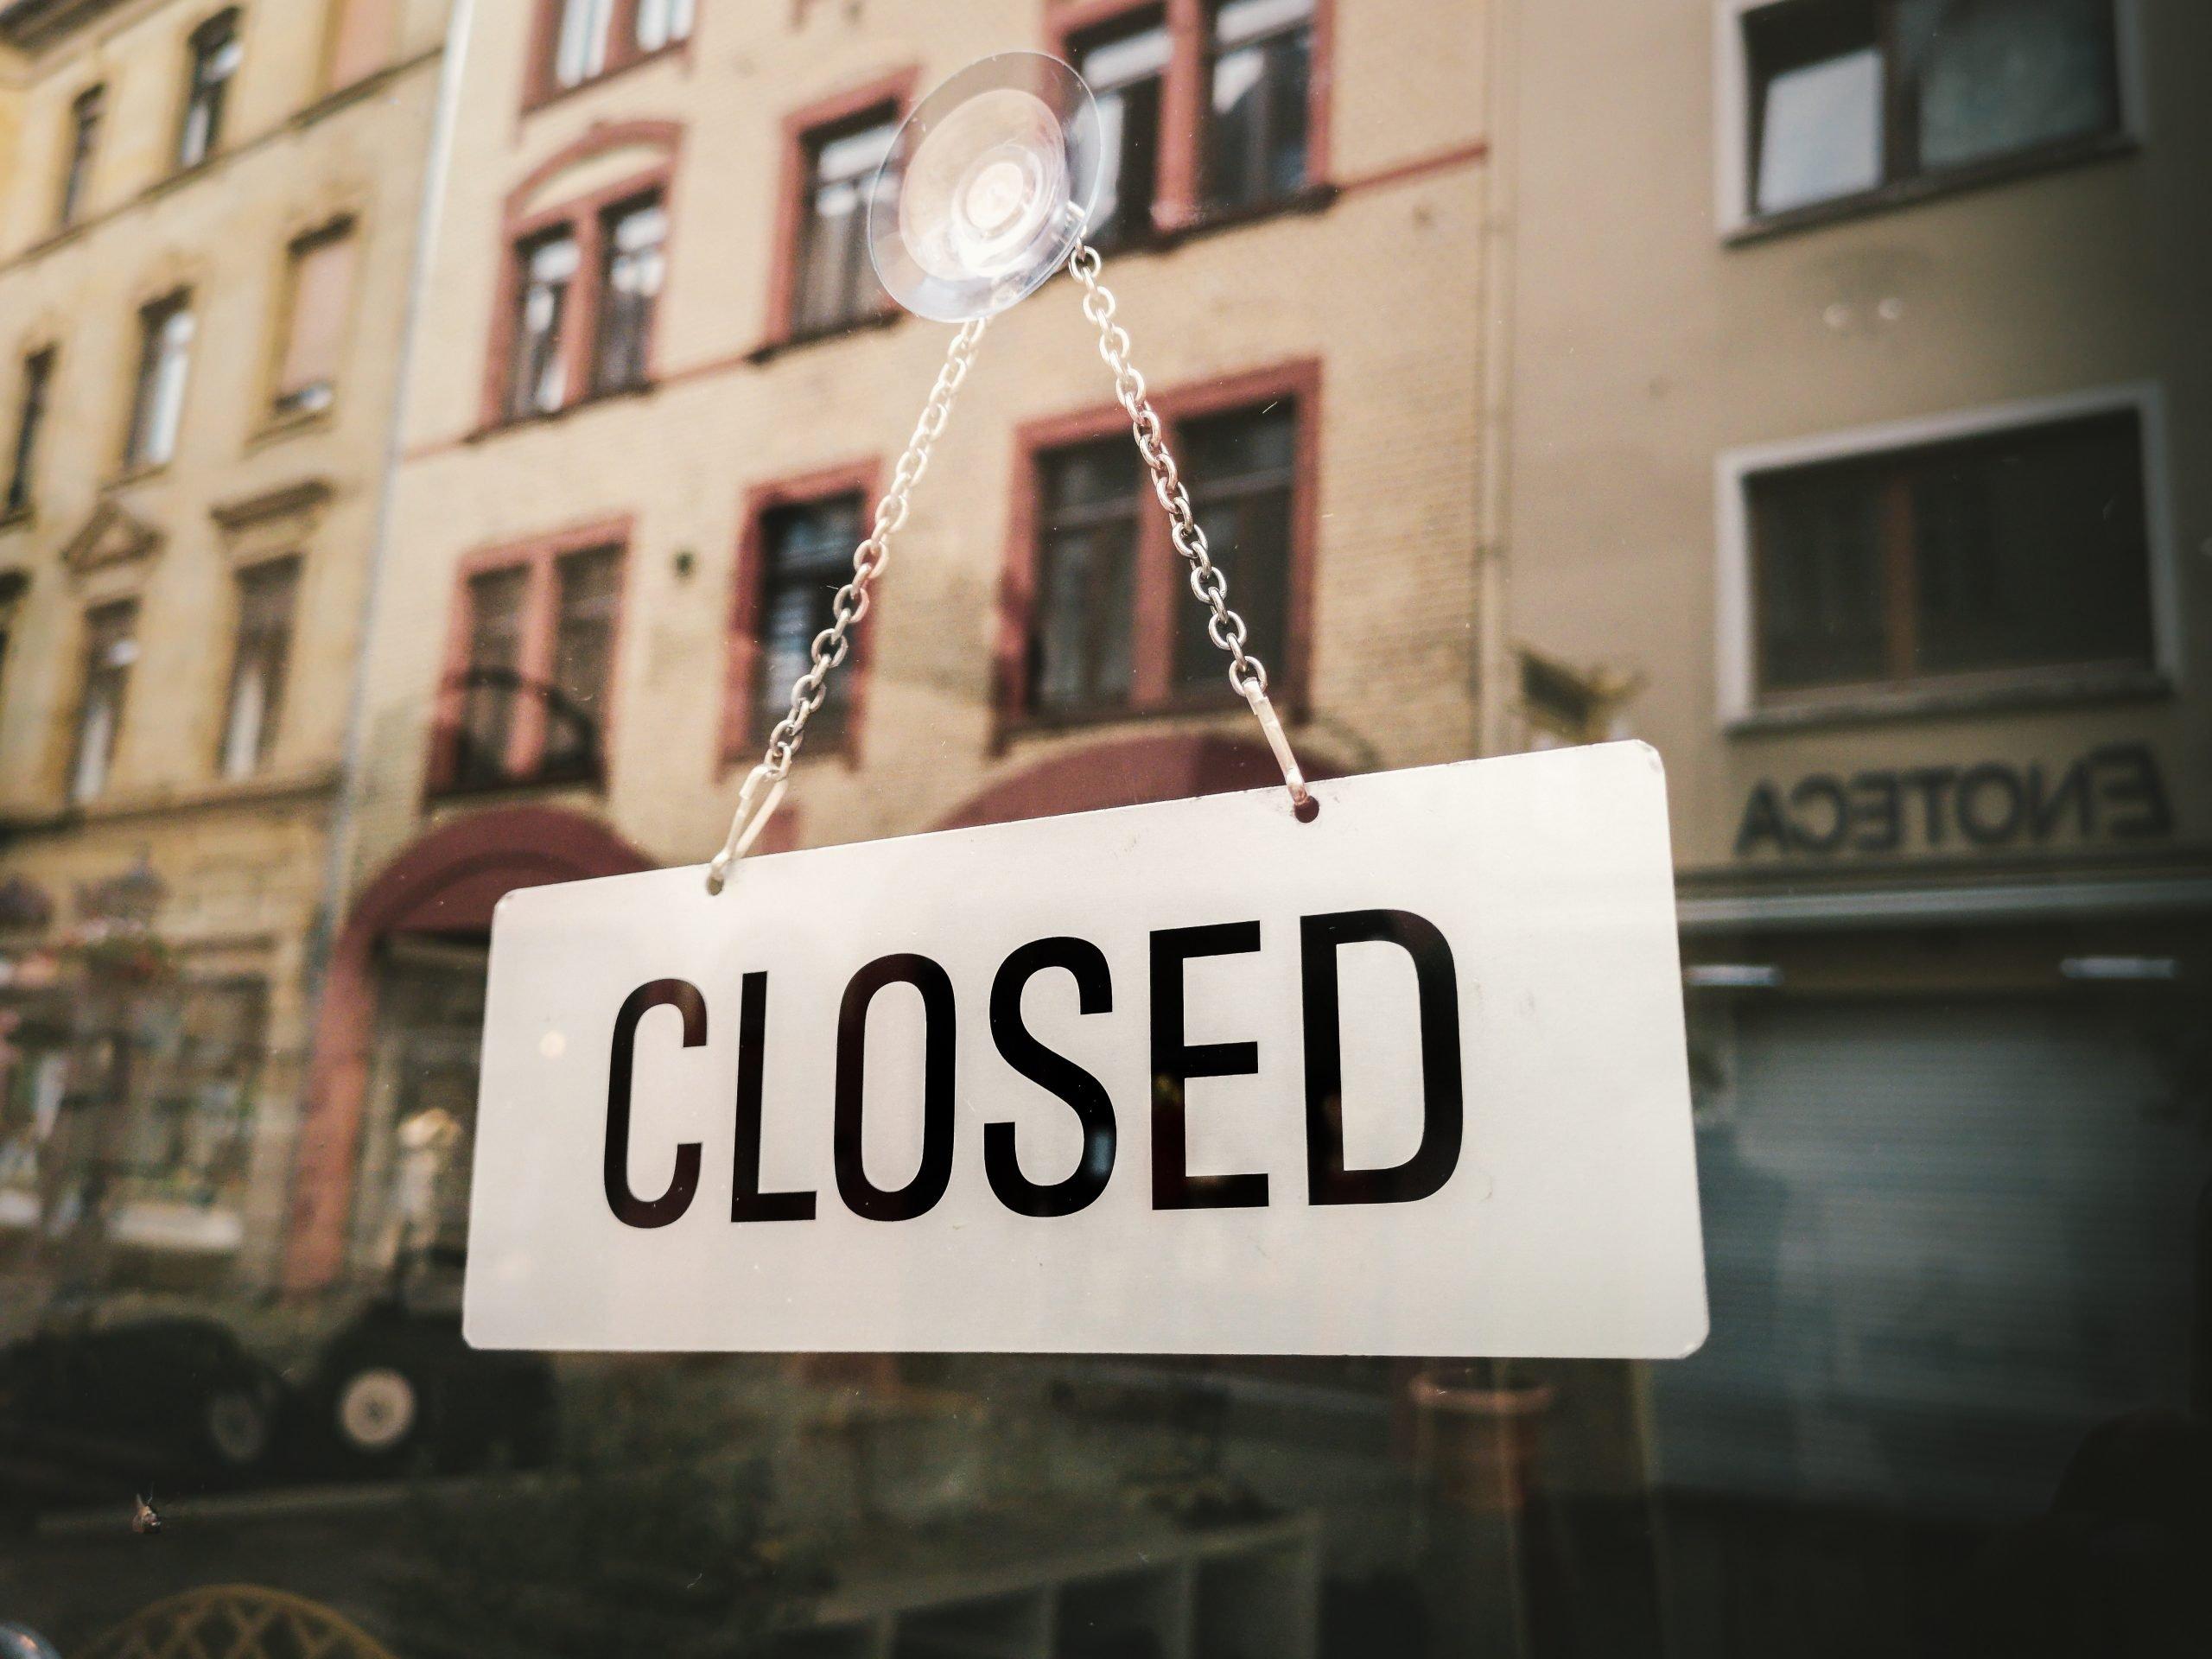 SCS | School Closing in Response to Governor's DeWine's Orders